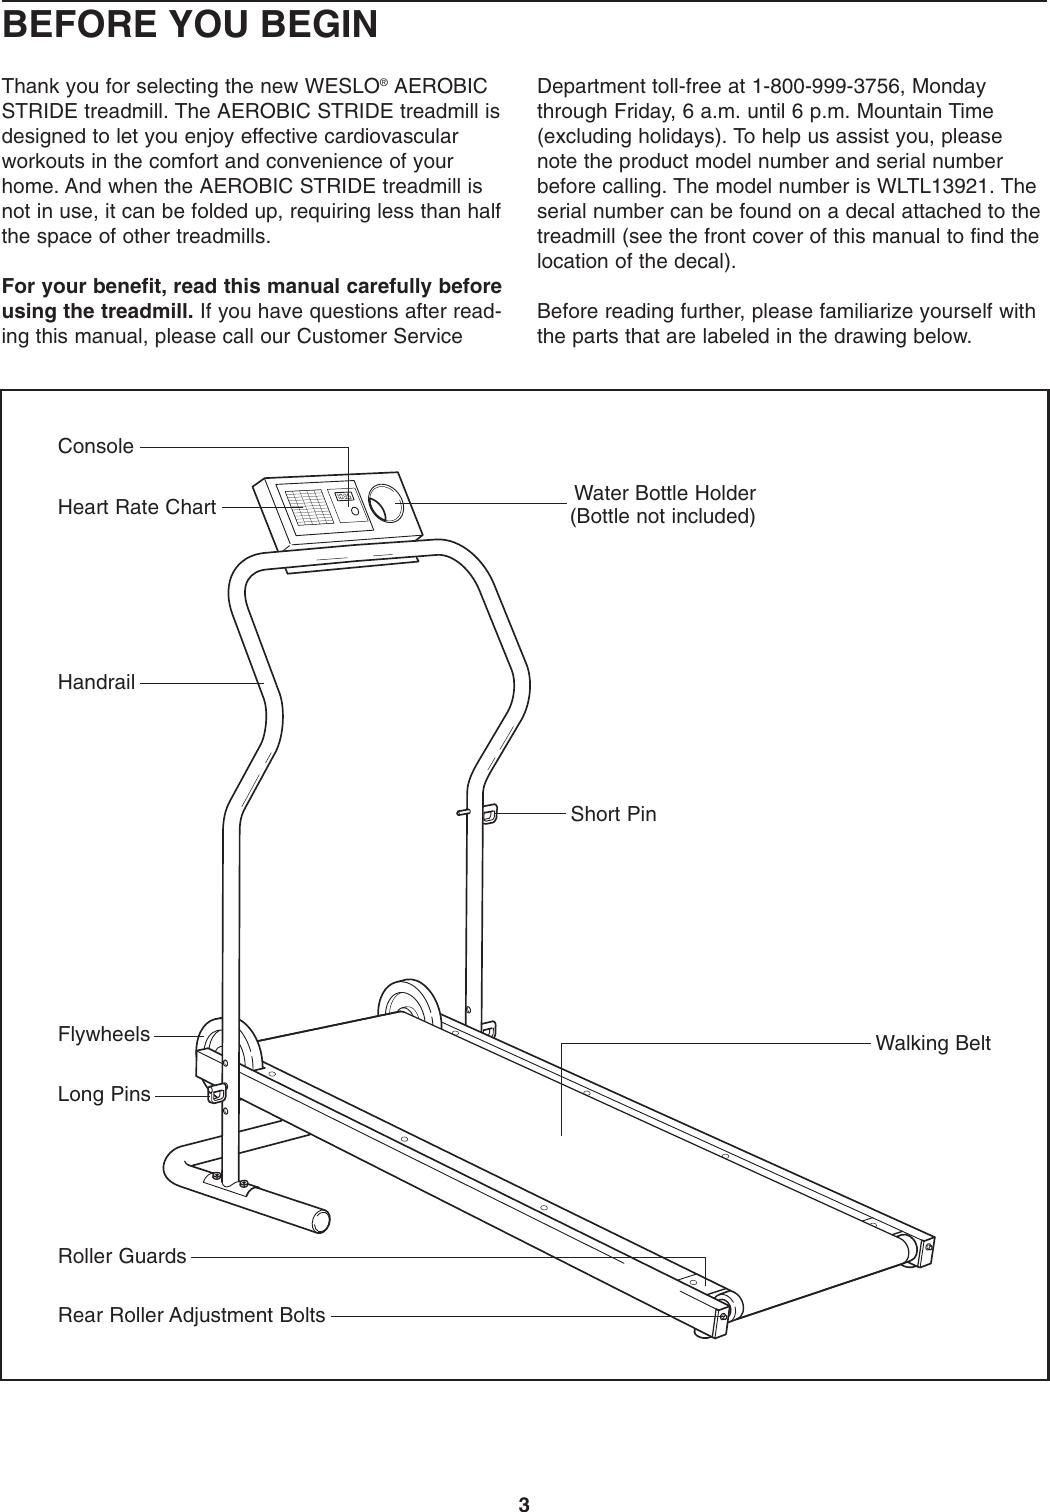 Weslo Aerobicstride Wltl 13921 Users Manual *WLTL13921 193469